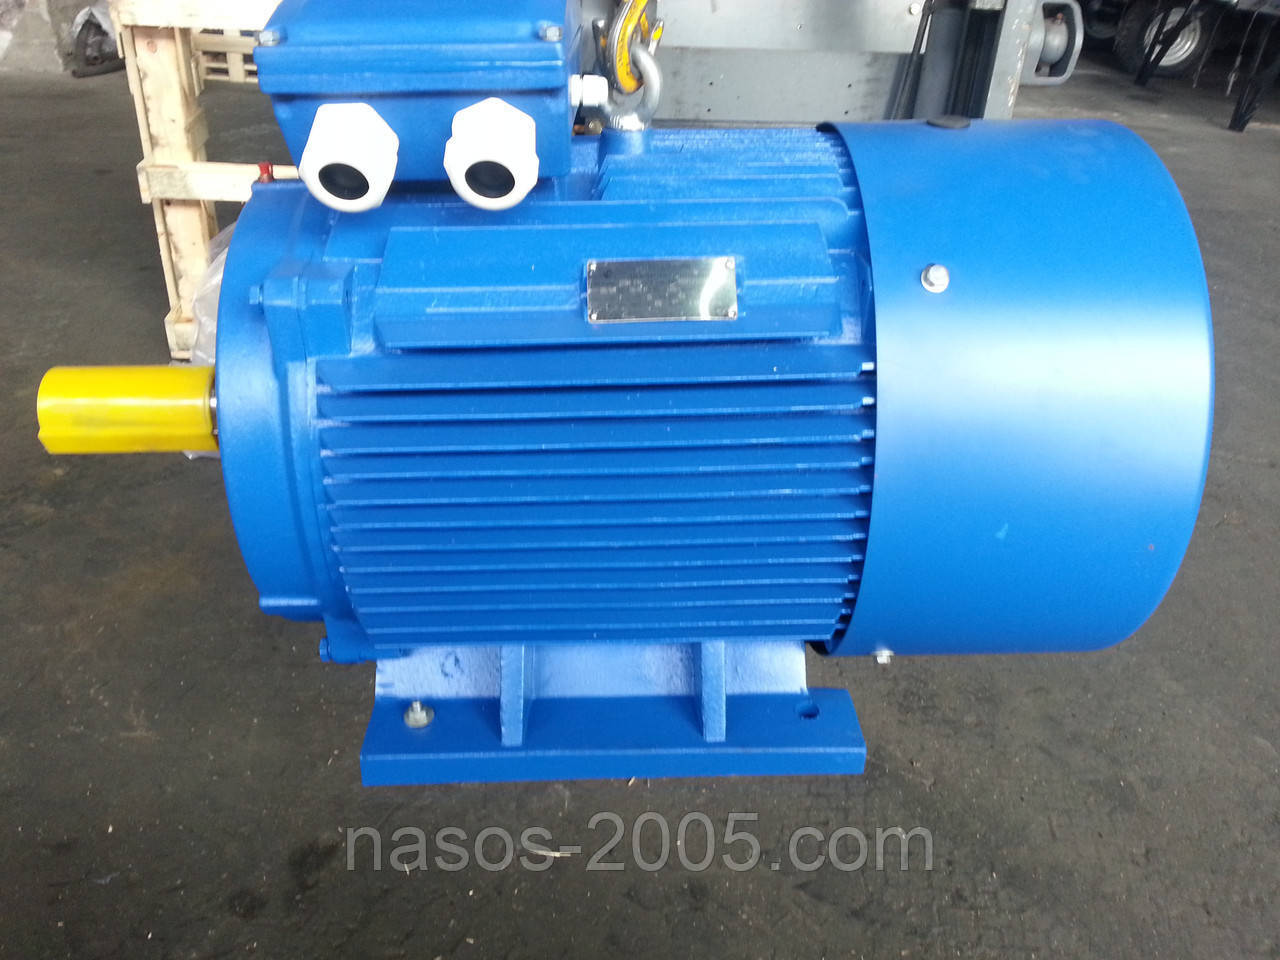 Електродвигун АИР 90 L2 3 кВт 3000 об/хв